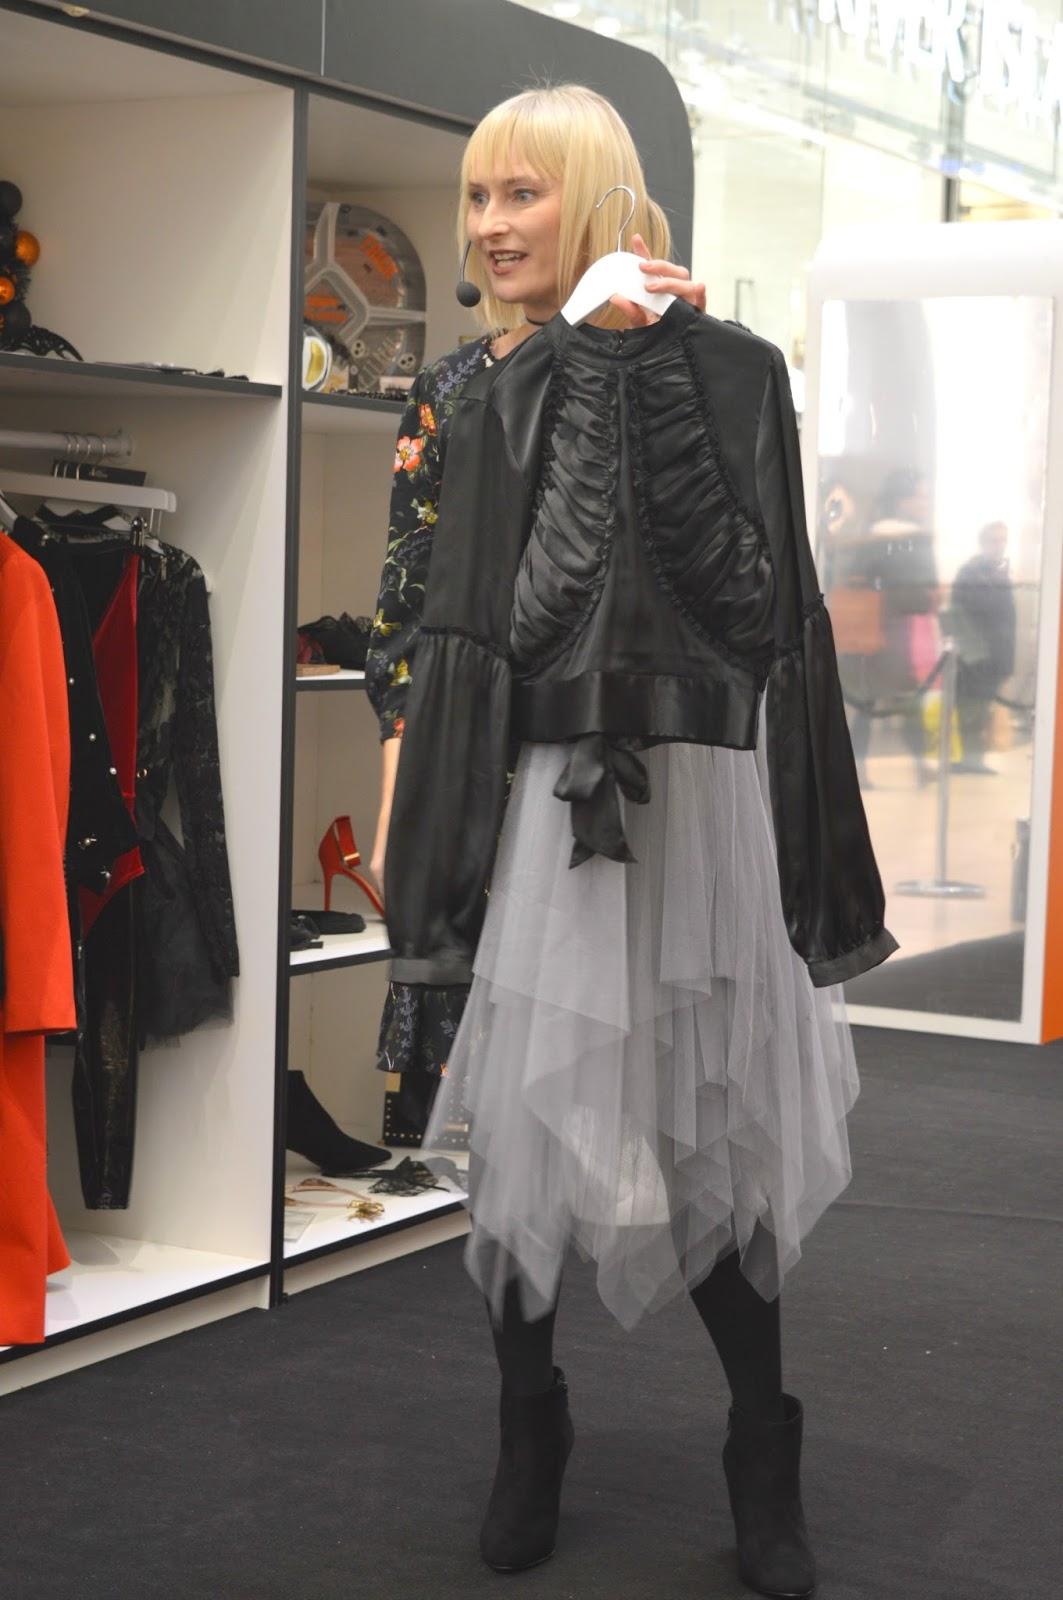 The Fashion Spooktacular Intu Eldon Square  - Stylist